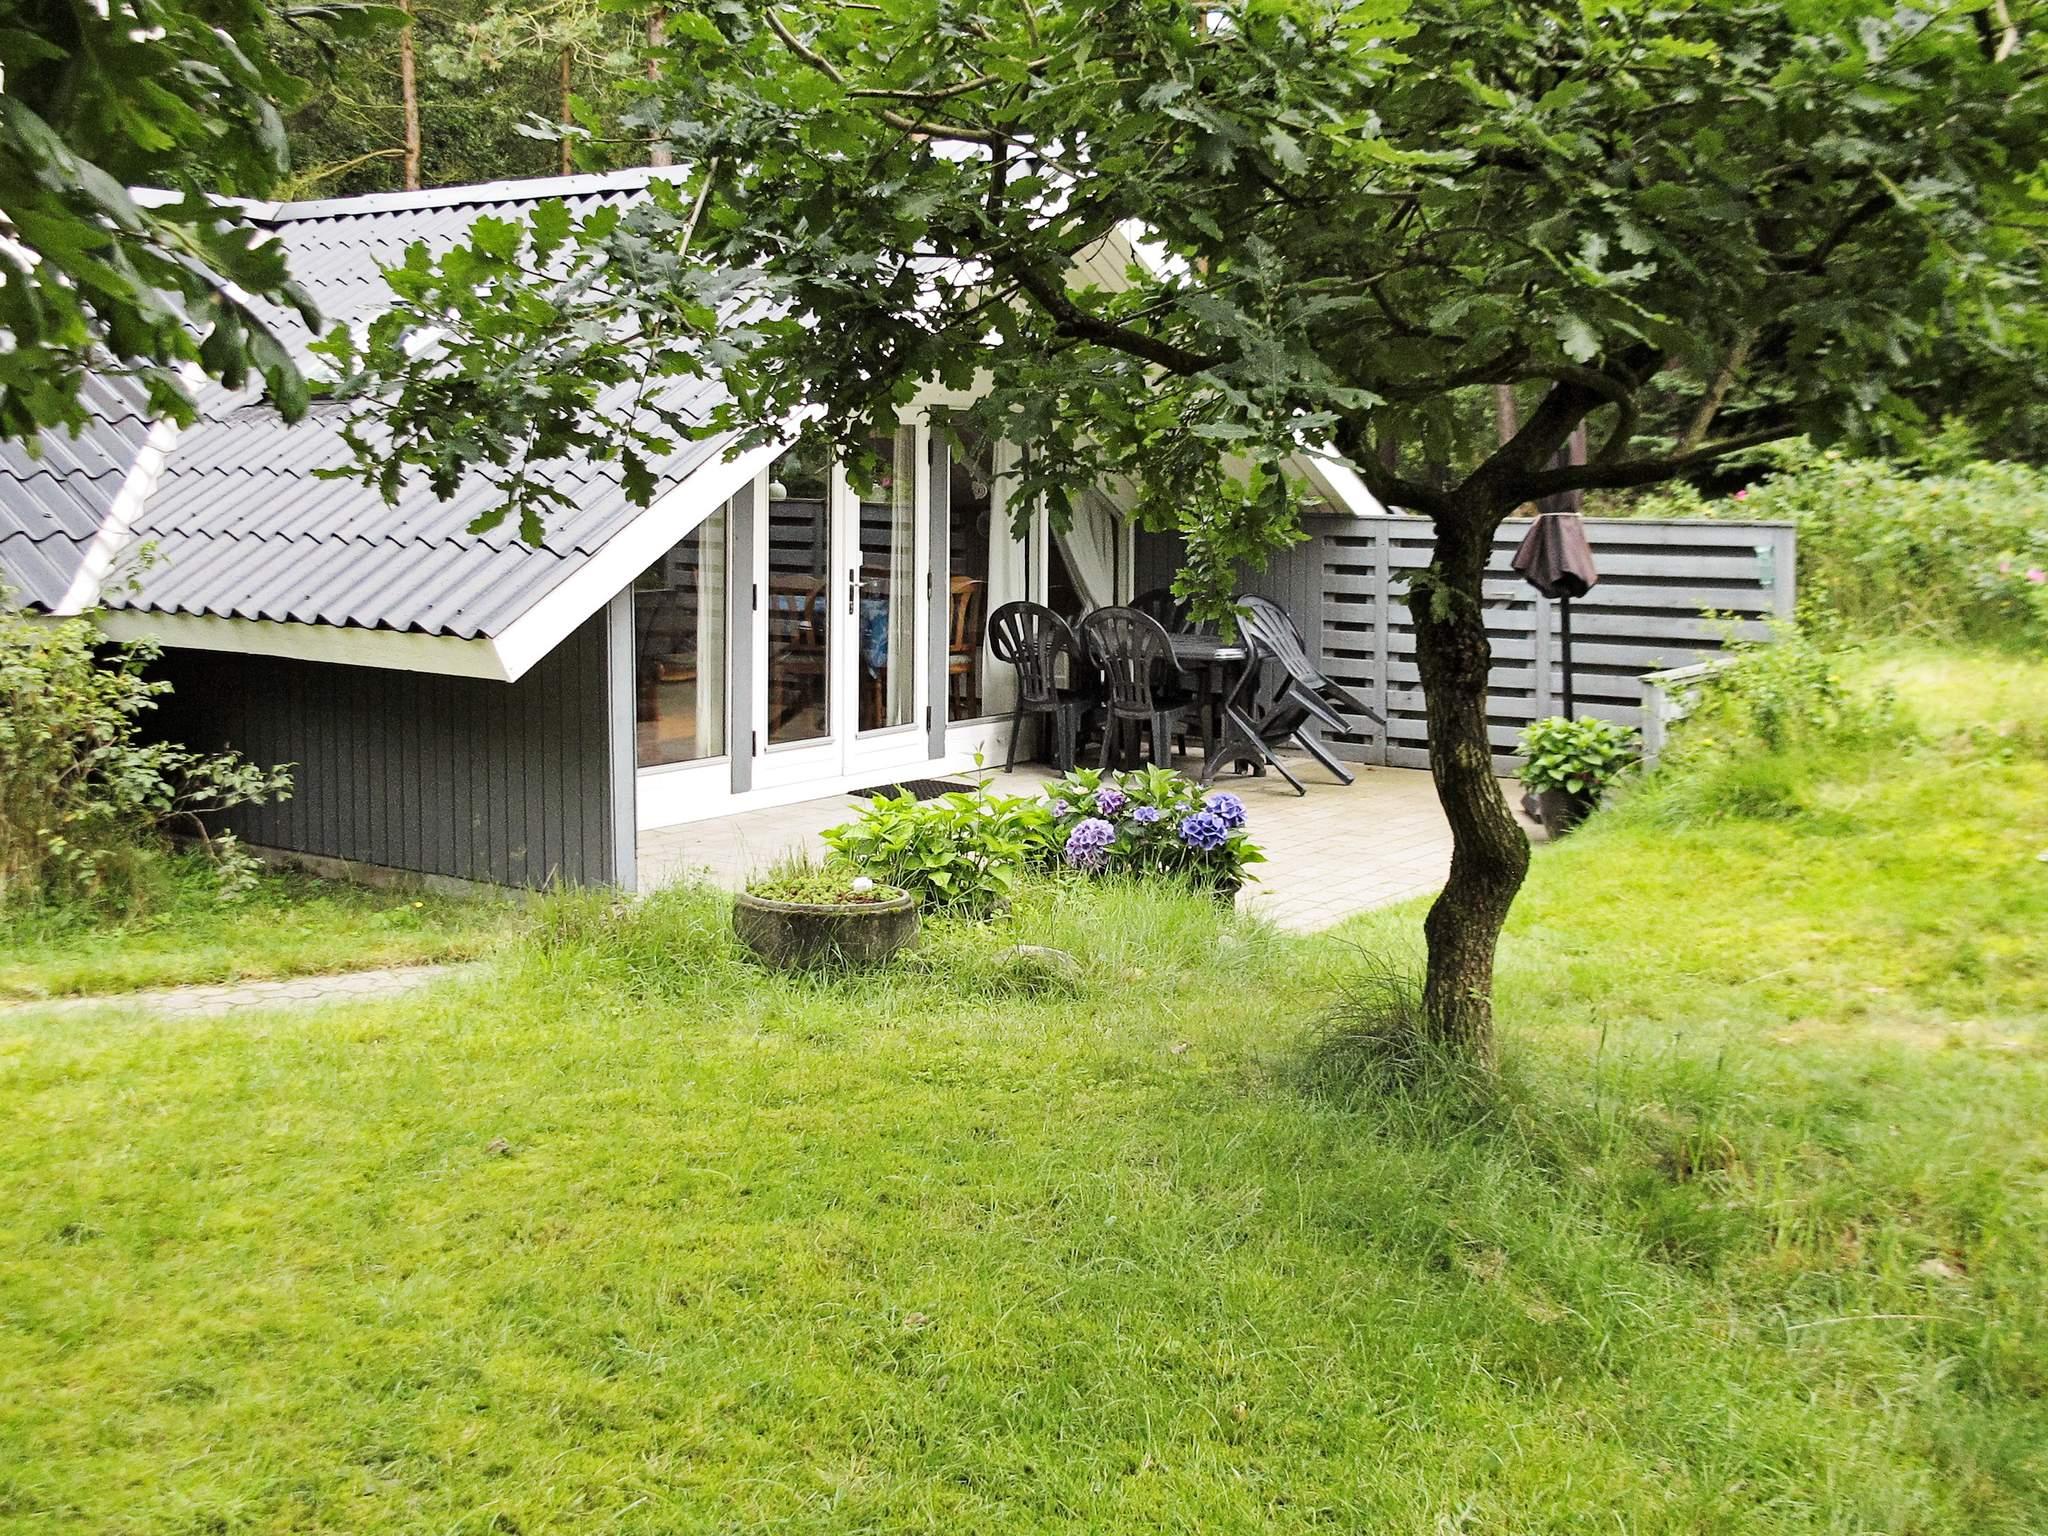 Ferienhaus Hou Nord/Melholt (88048), Hou, , Nordostjütland, Dänemark, Bild 38